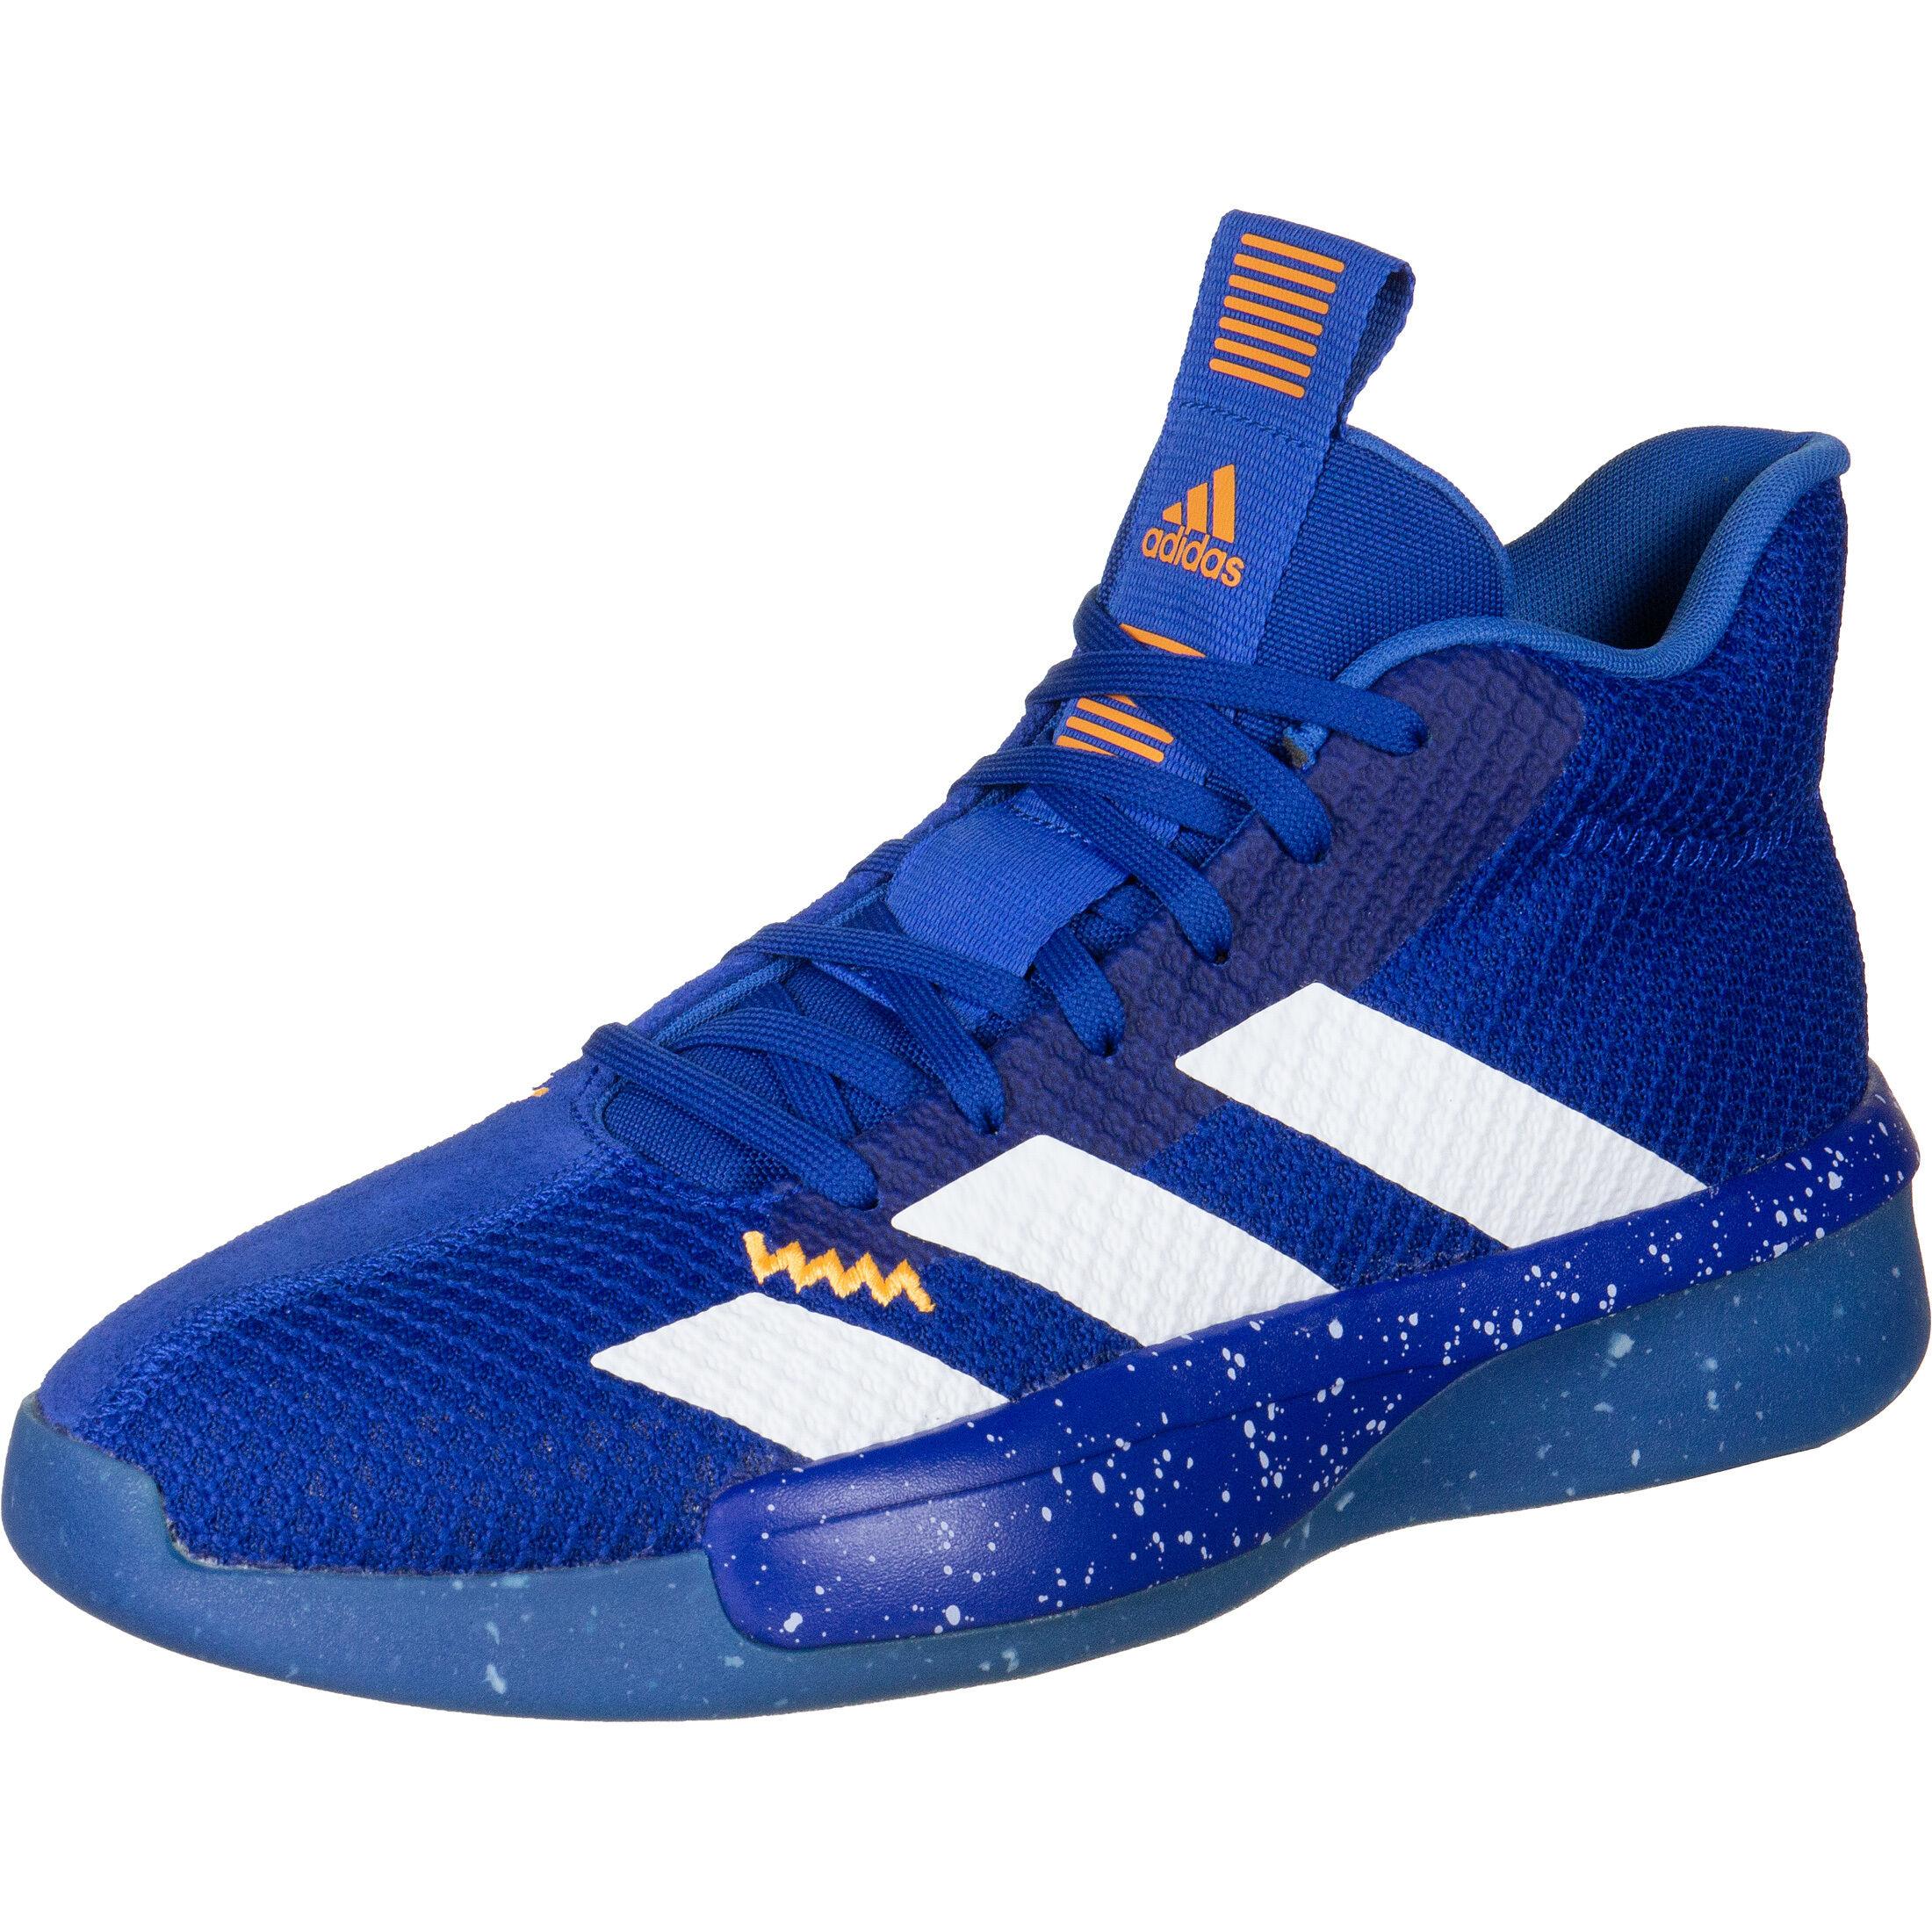 Basketballschuhe kaufen adidas Performance | Basketball bei